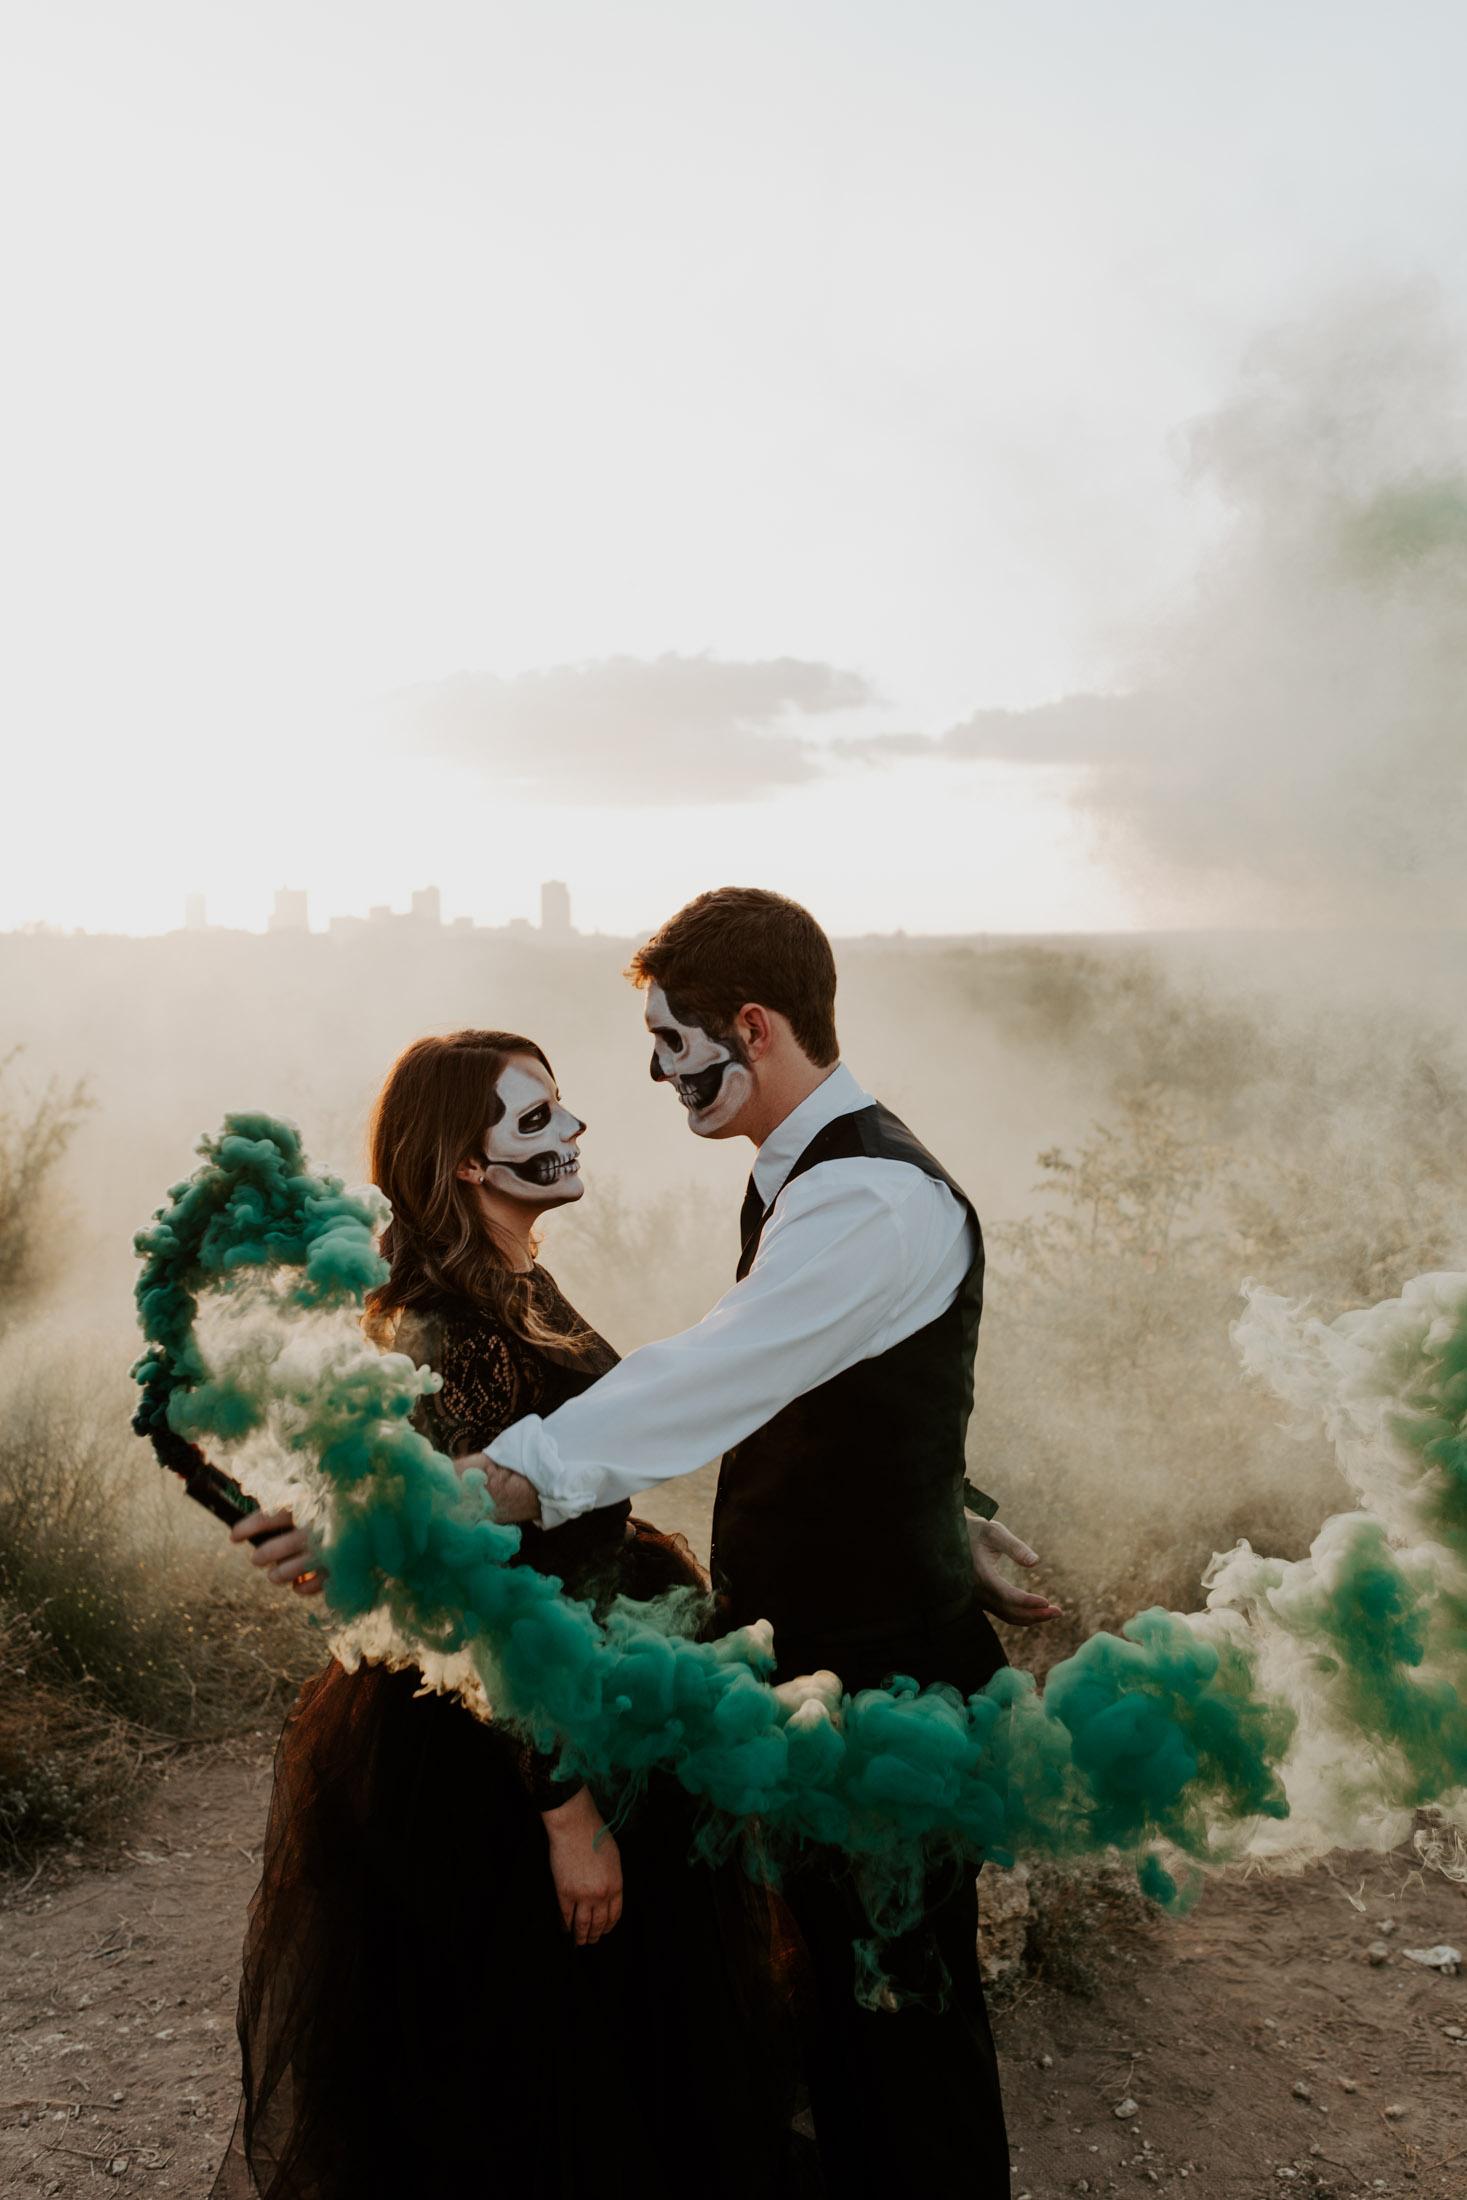 boy holding green smoke bomb for halloween themed photo shoot